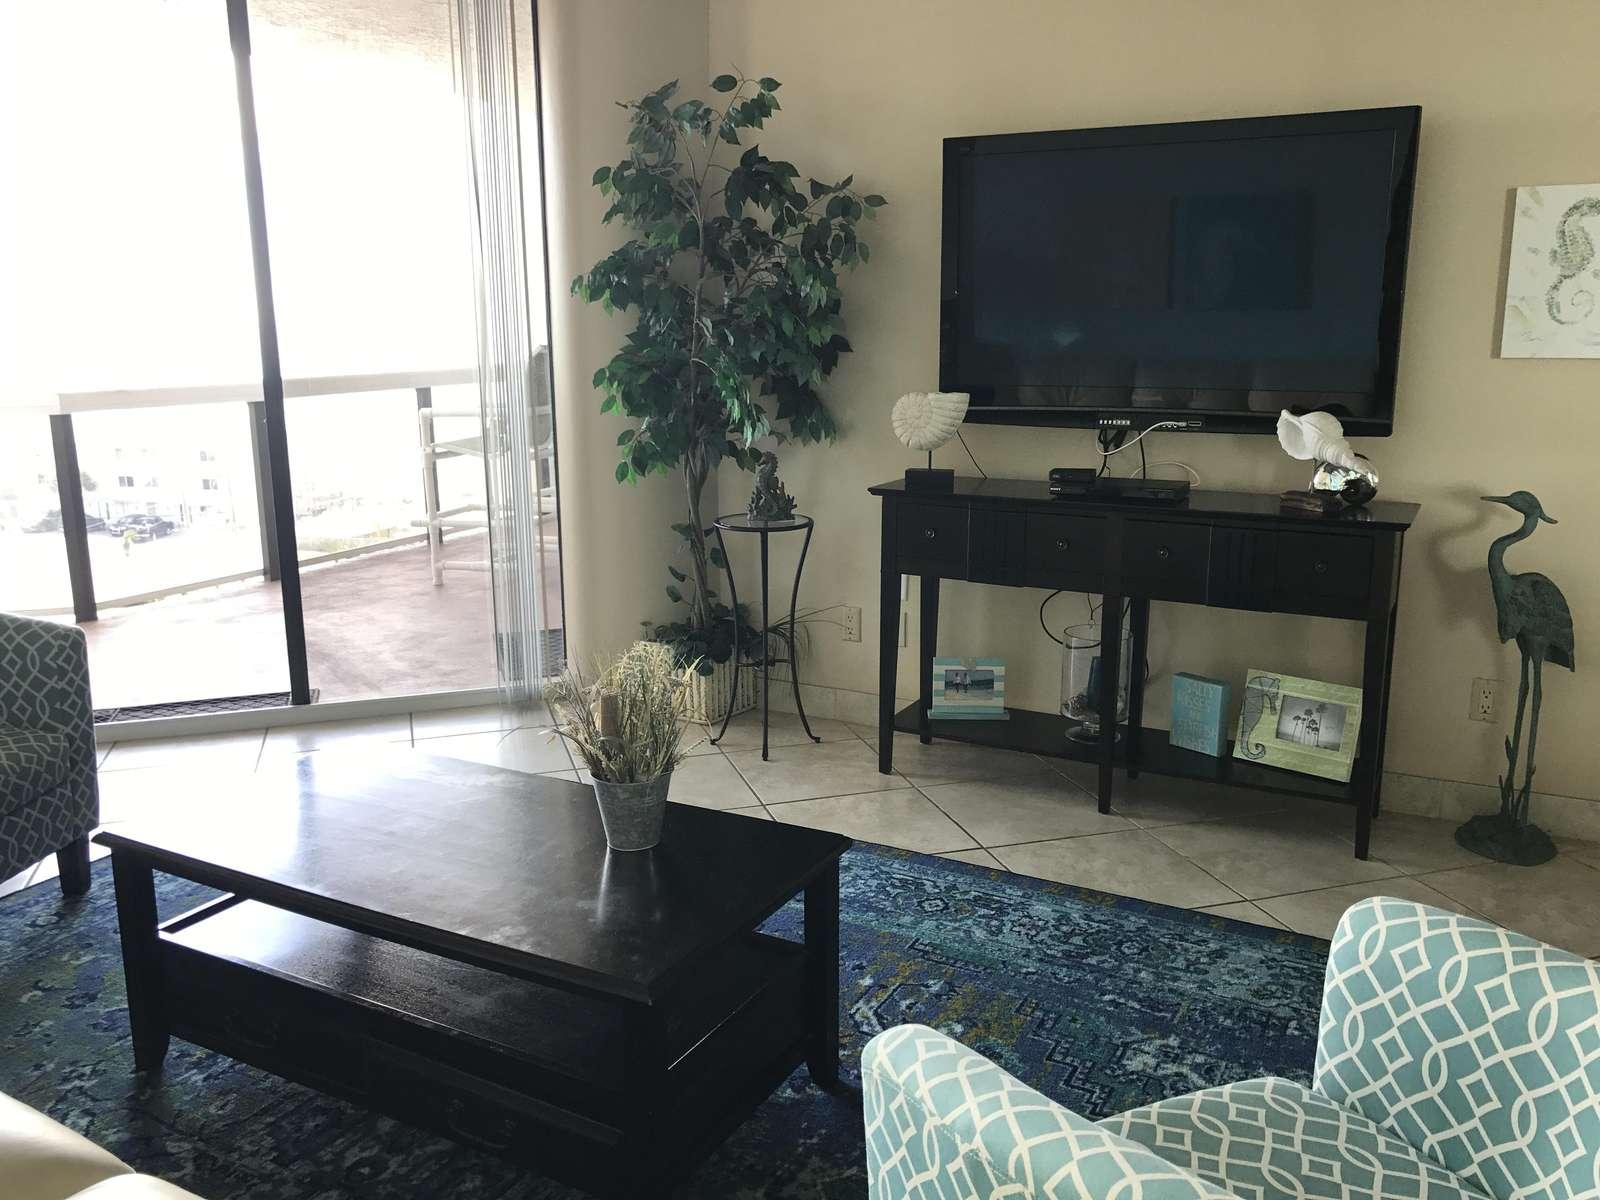 The large flat screen tv